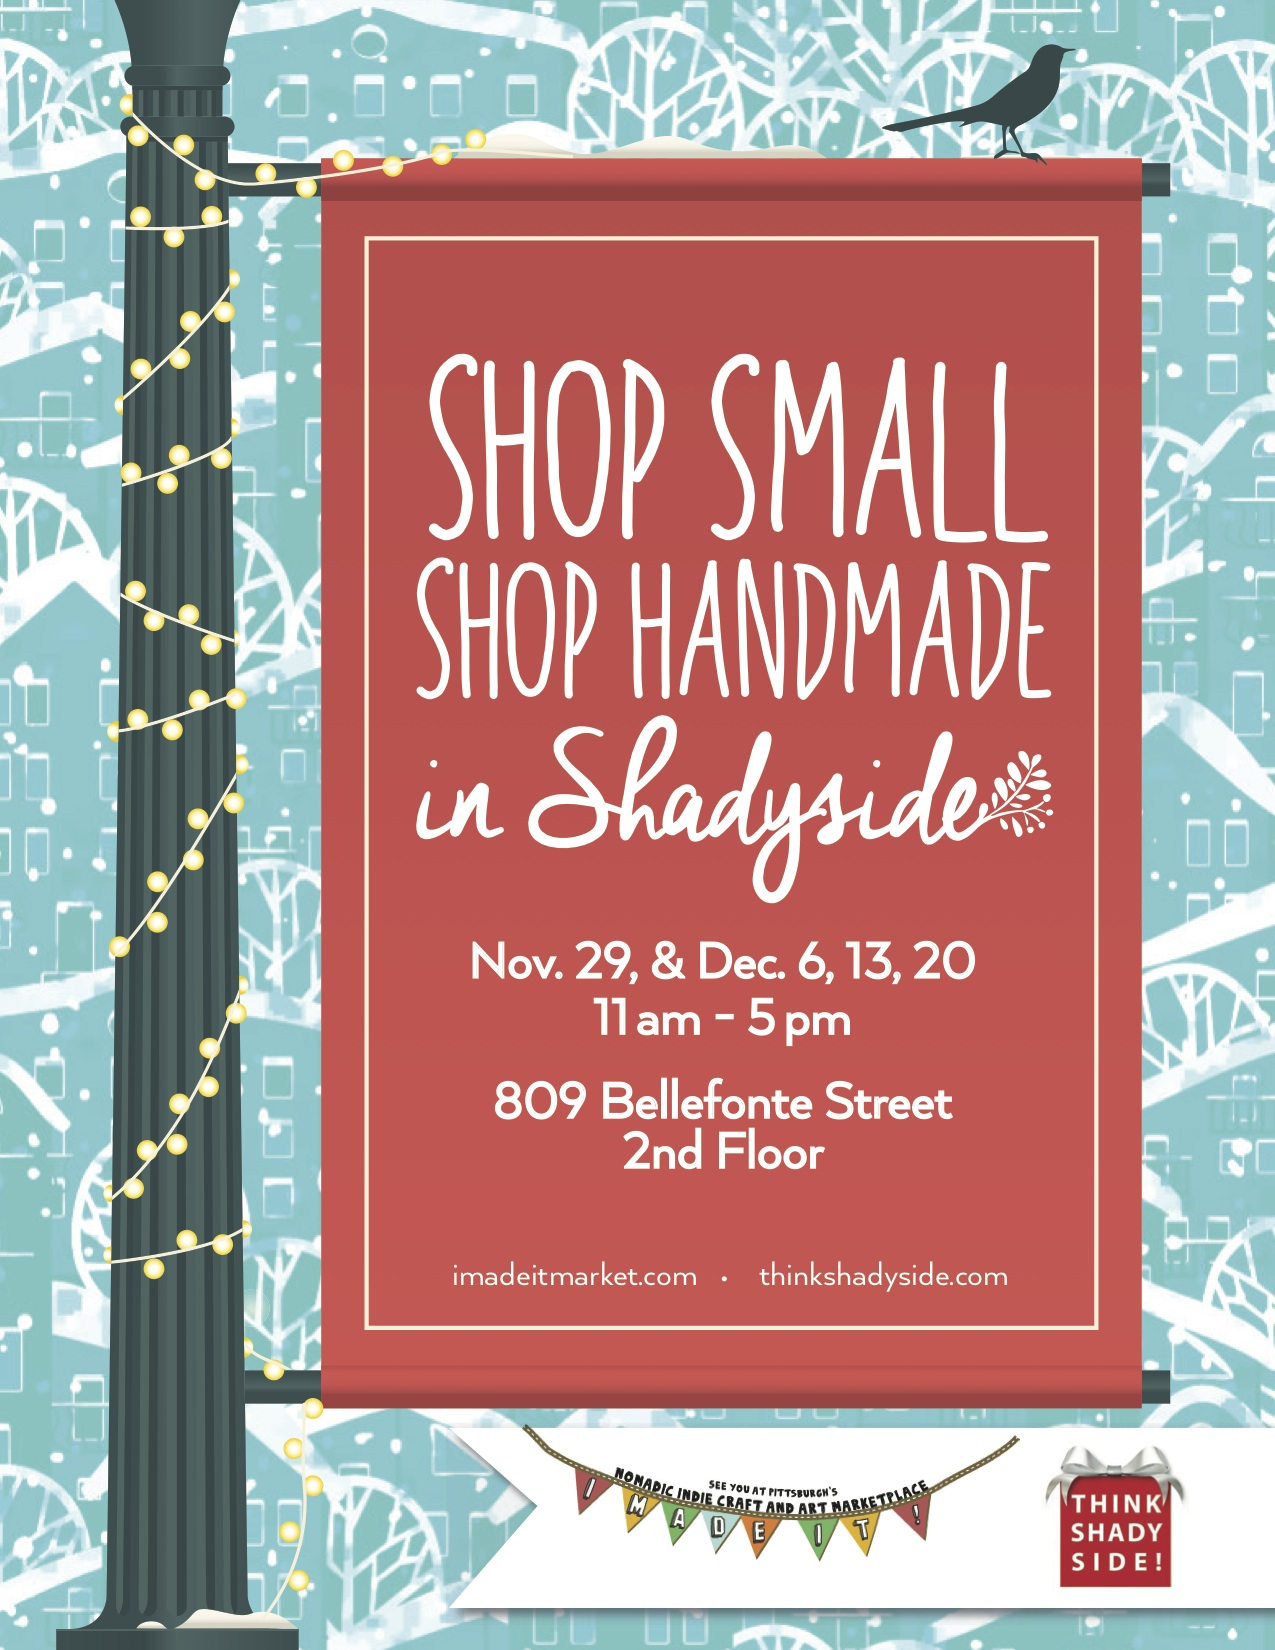 Shop Small Shop Local in Shadyside